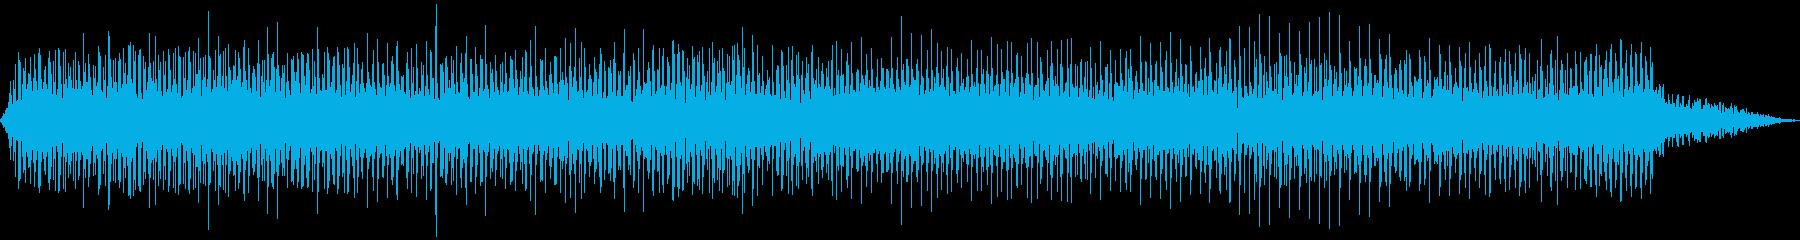 JACKHAMMER:ショートラン...の再生済みの波形